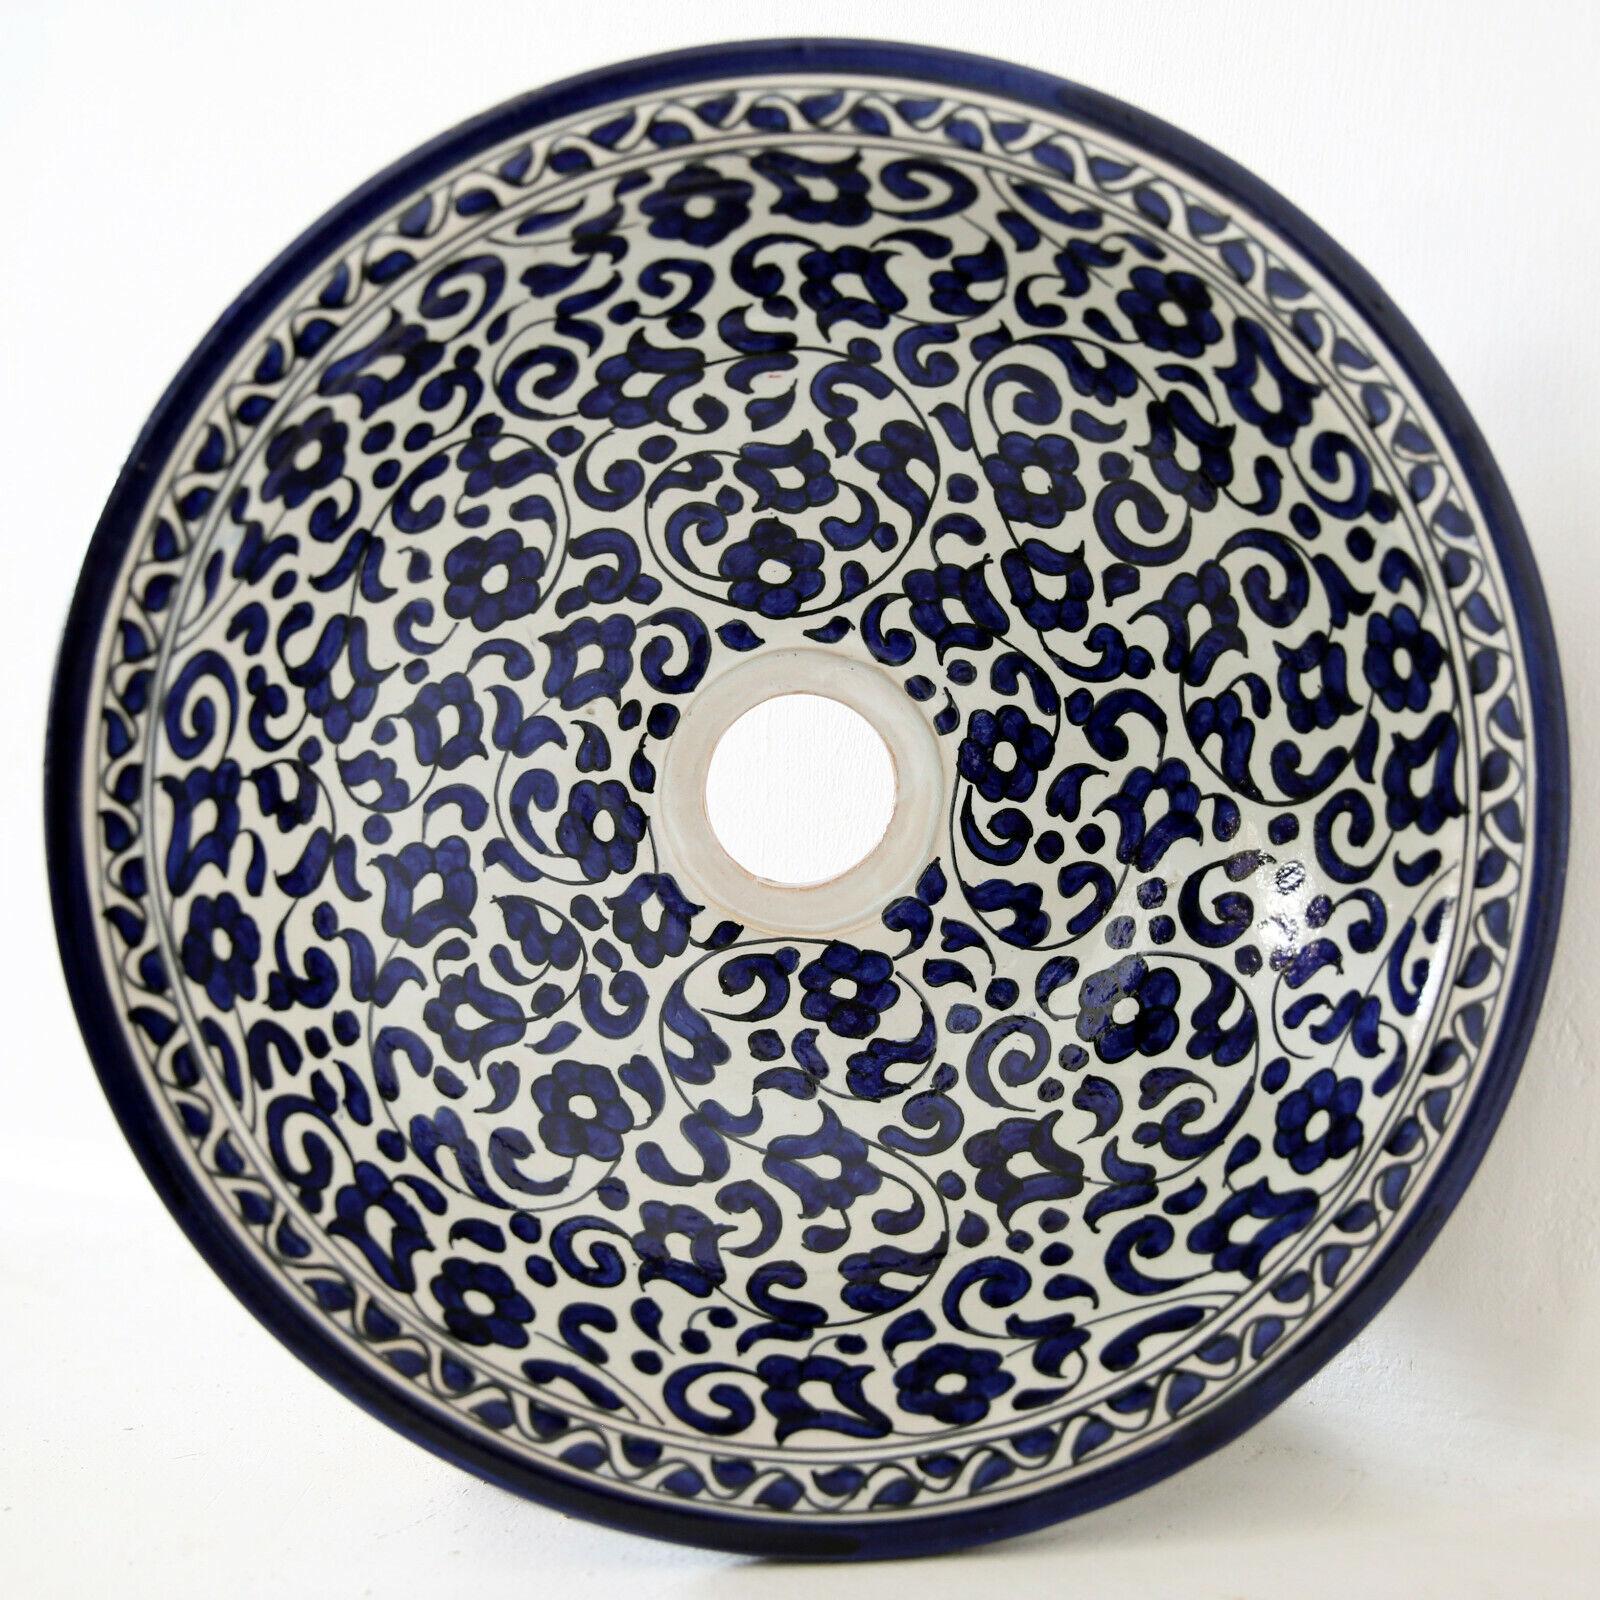 Marokkanisches Bacino Tondo Artigianale Ceramica Lavandino D35 Fes-V-Ii